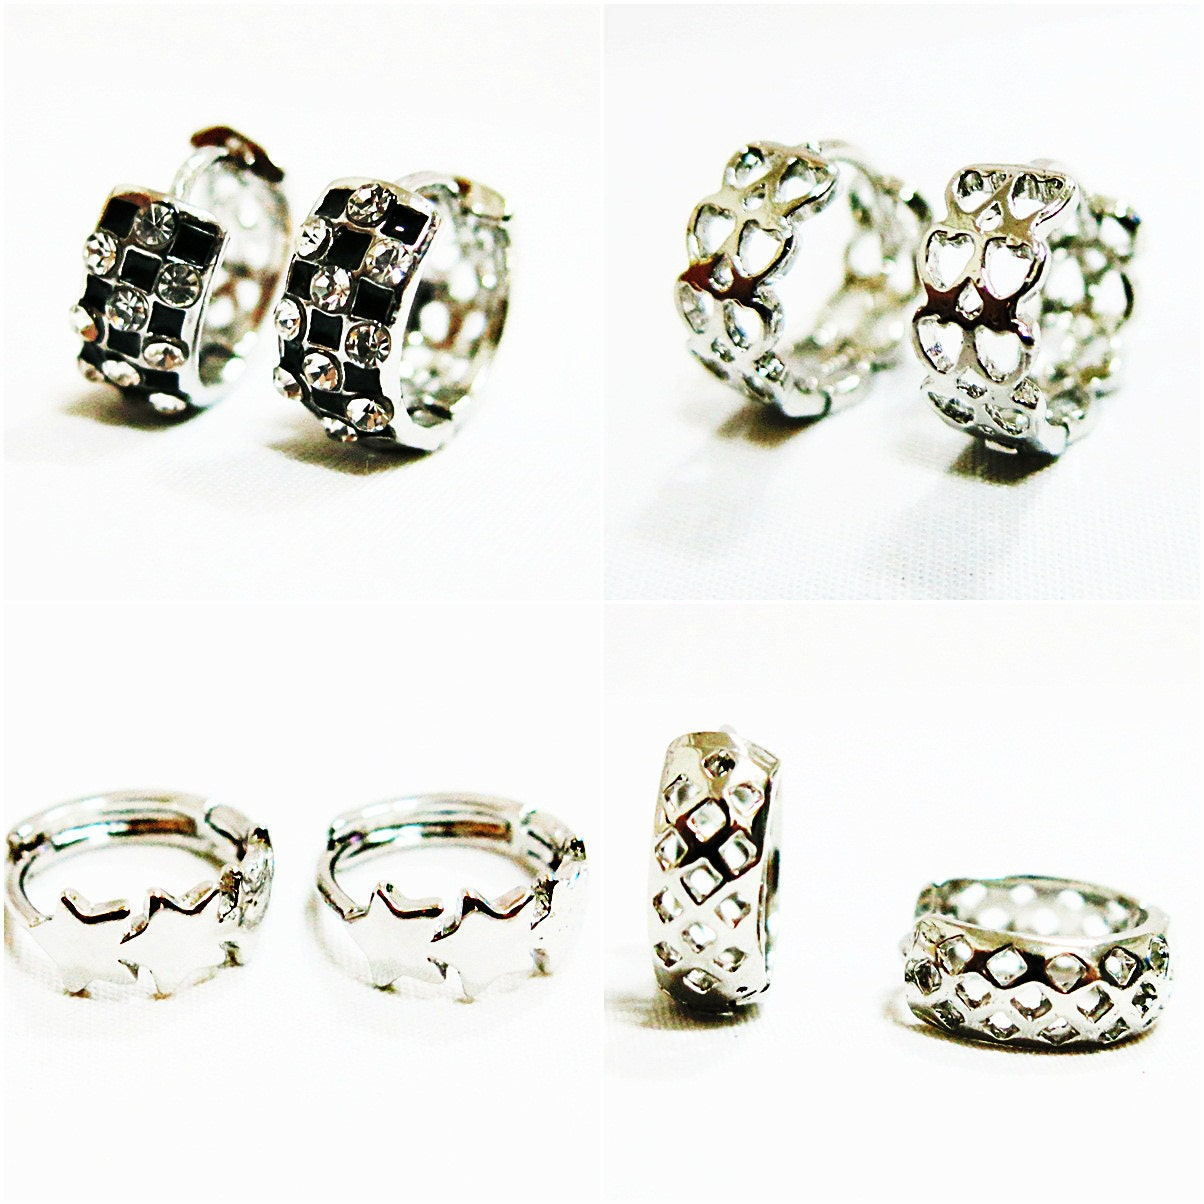 silver hoop earrings silver hoops star hoop small by susysshop. Black Bedroom Furniture Sets. Home Design Ideas